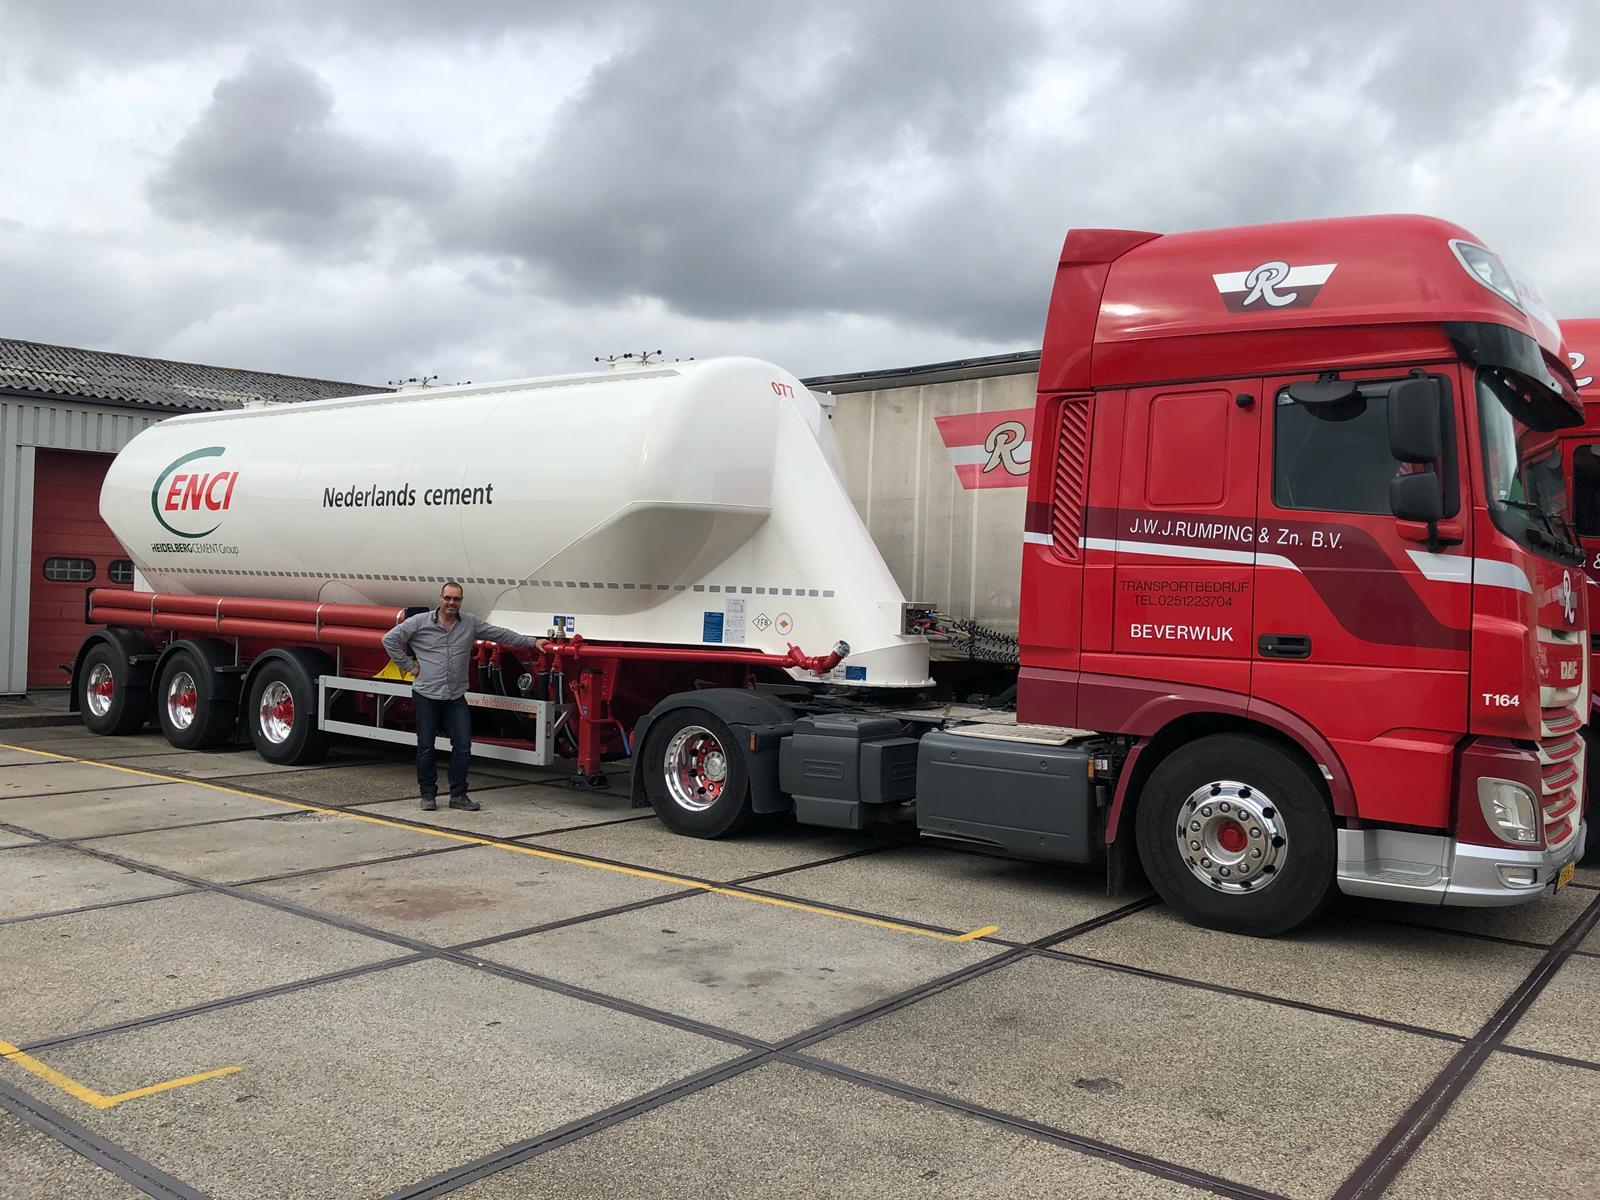 Daf-T-164-met-nieuwe-trailer-17-9-2018